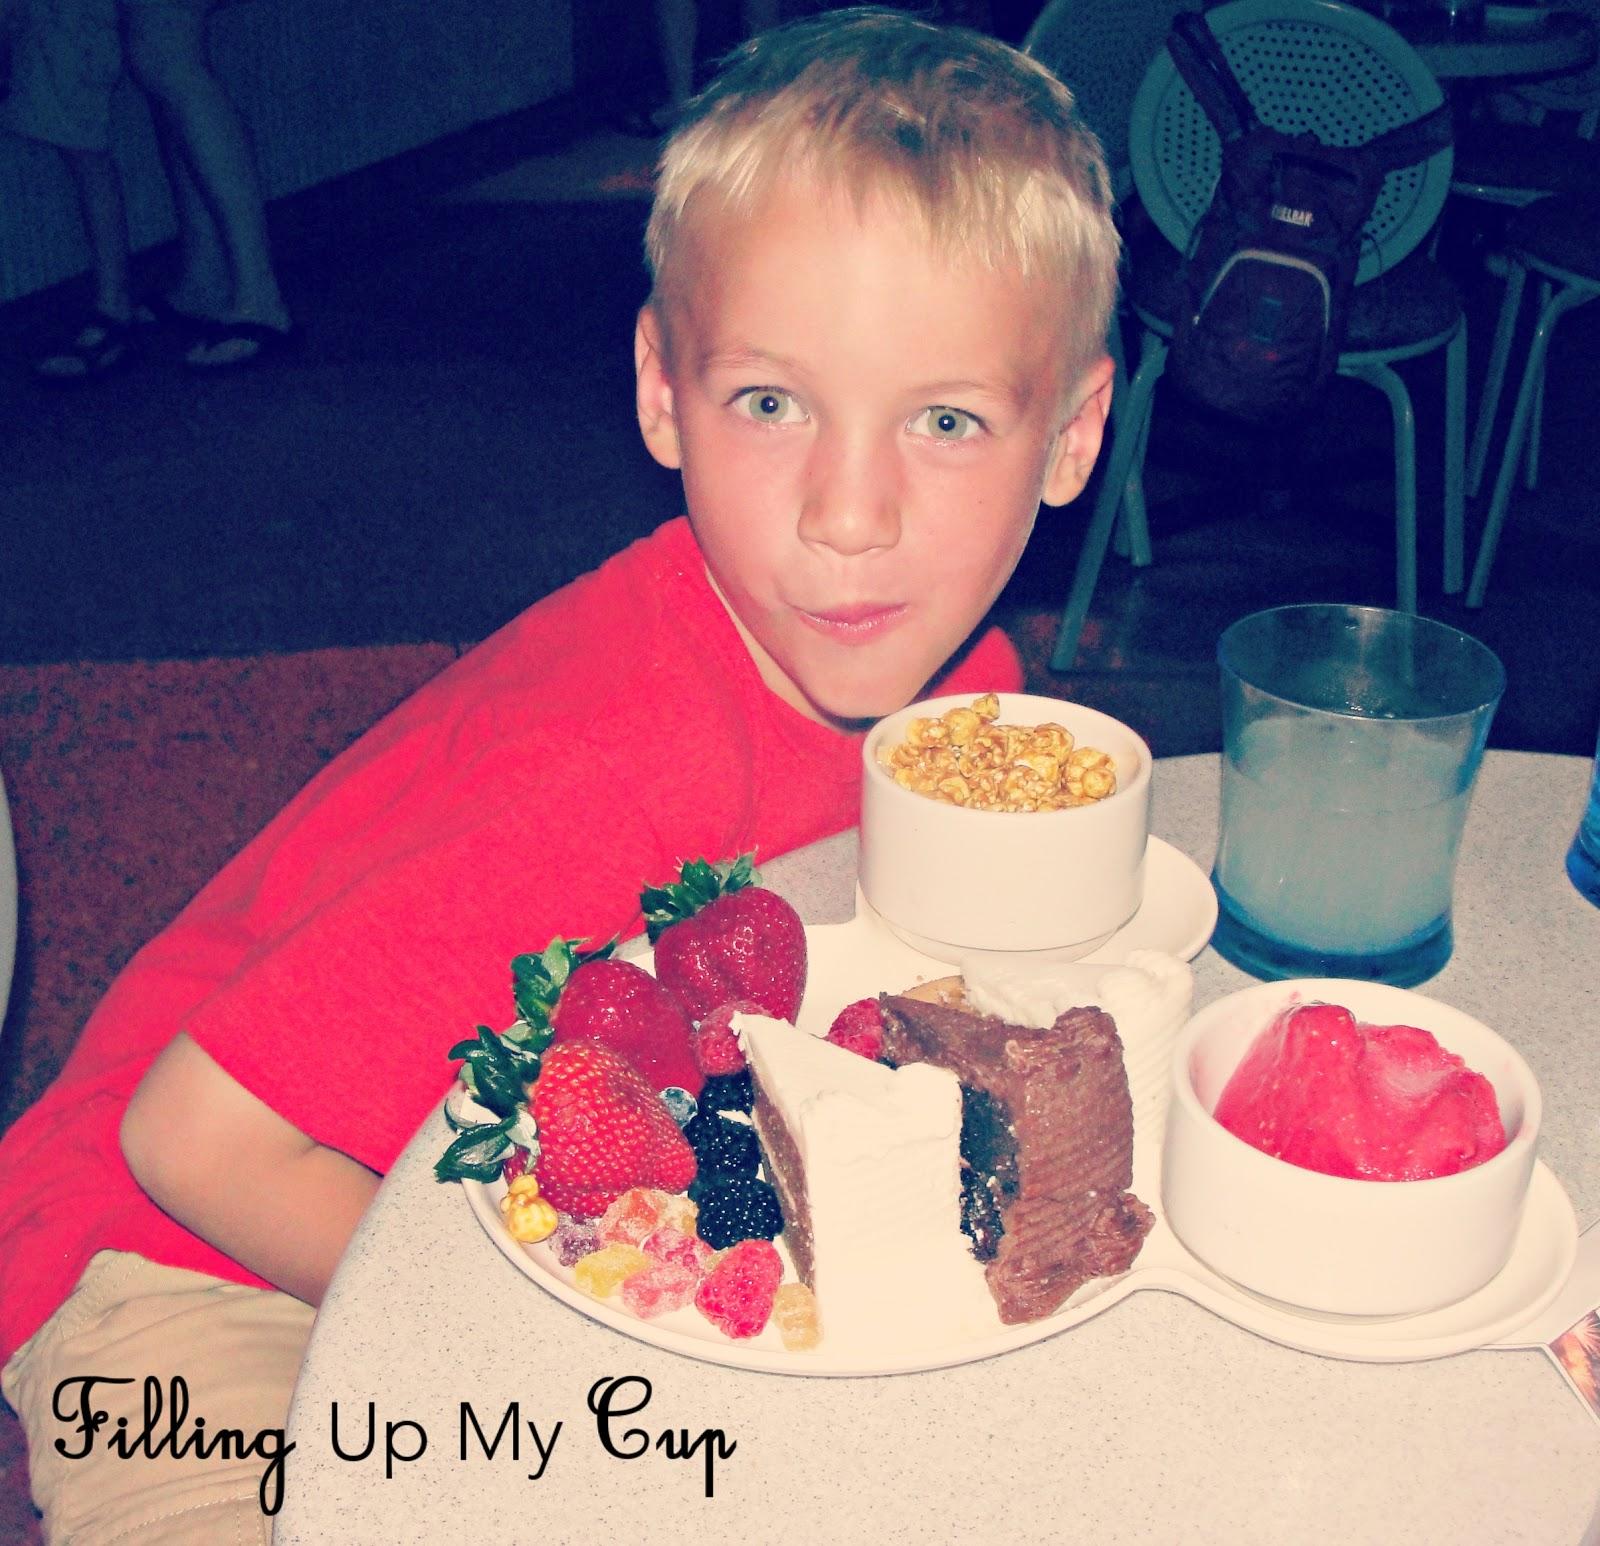 http://2.bp.blogspot.com/-EQNeECh361U/UKRerRUBRRI/AAAAAAAABeo/hngNOkRjH9w/s1600/peanut_free_desserts_WDW.jpg